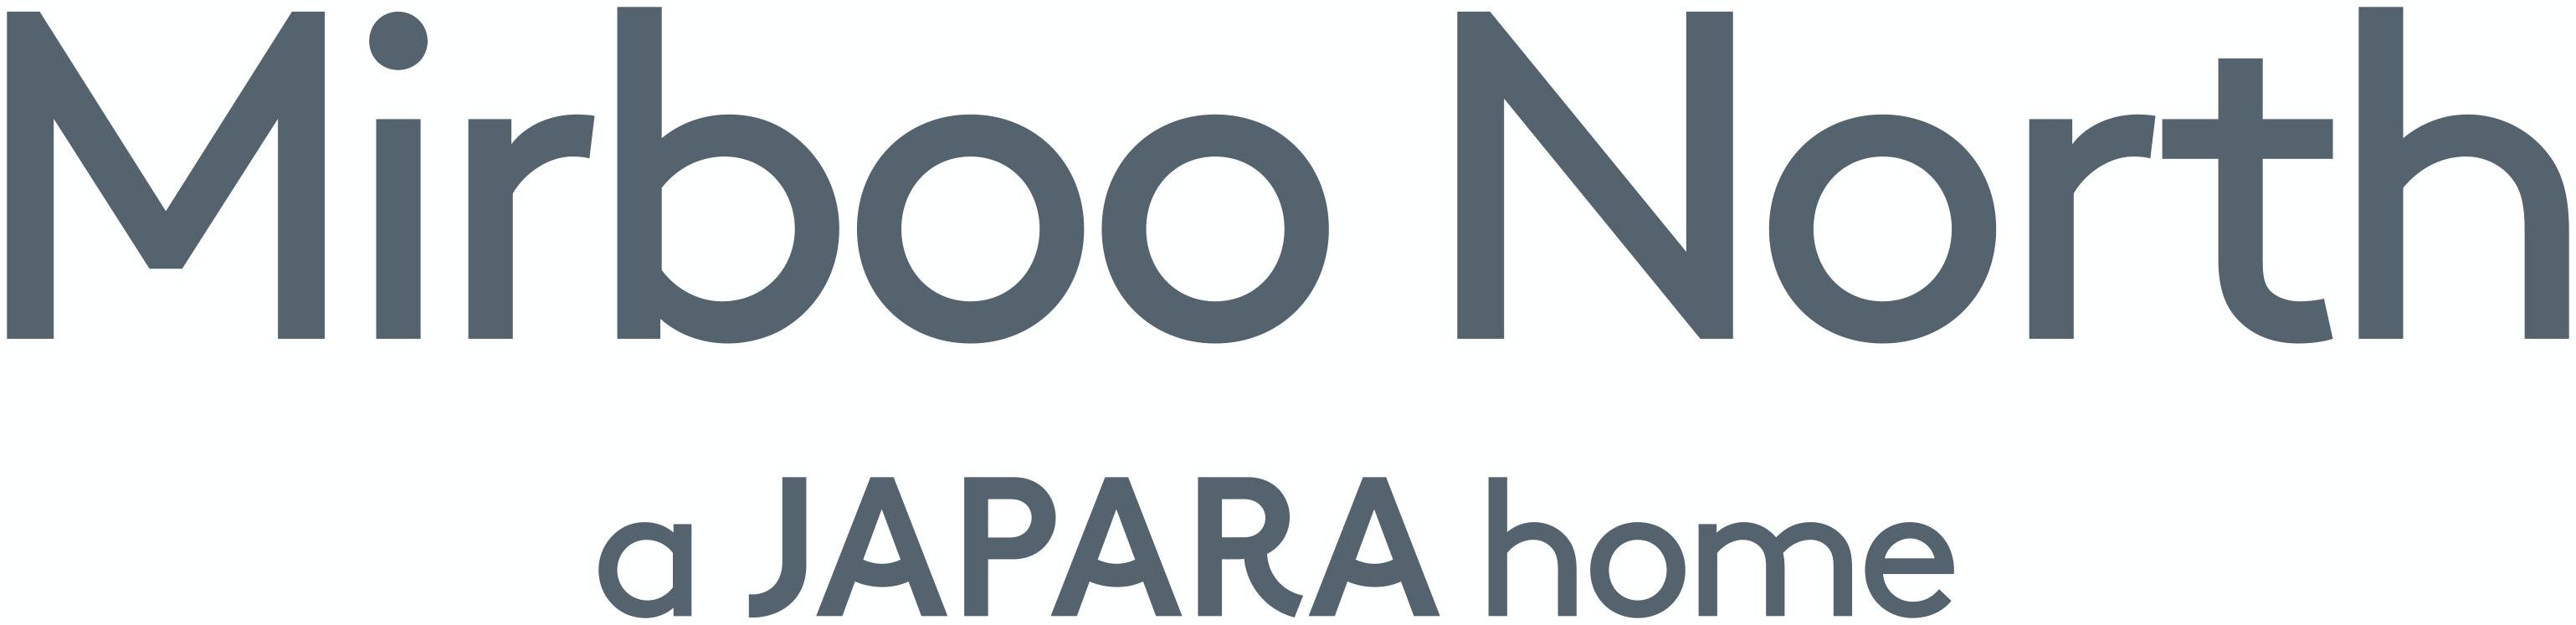 Mirboo North logo